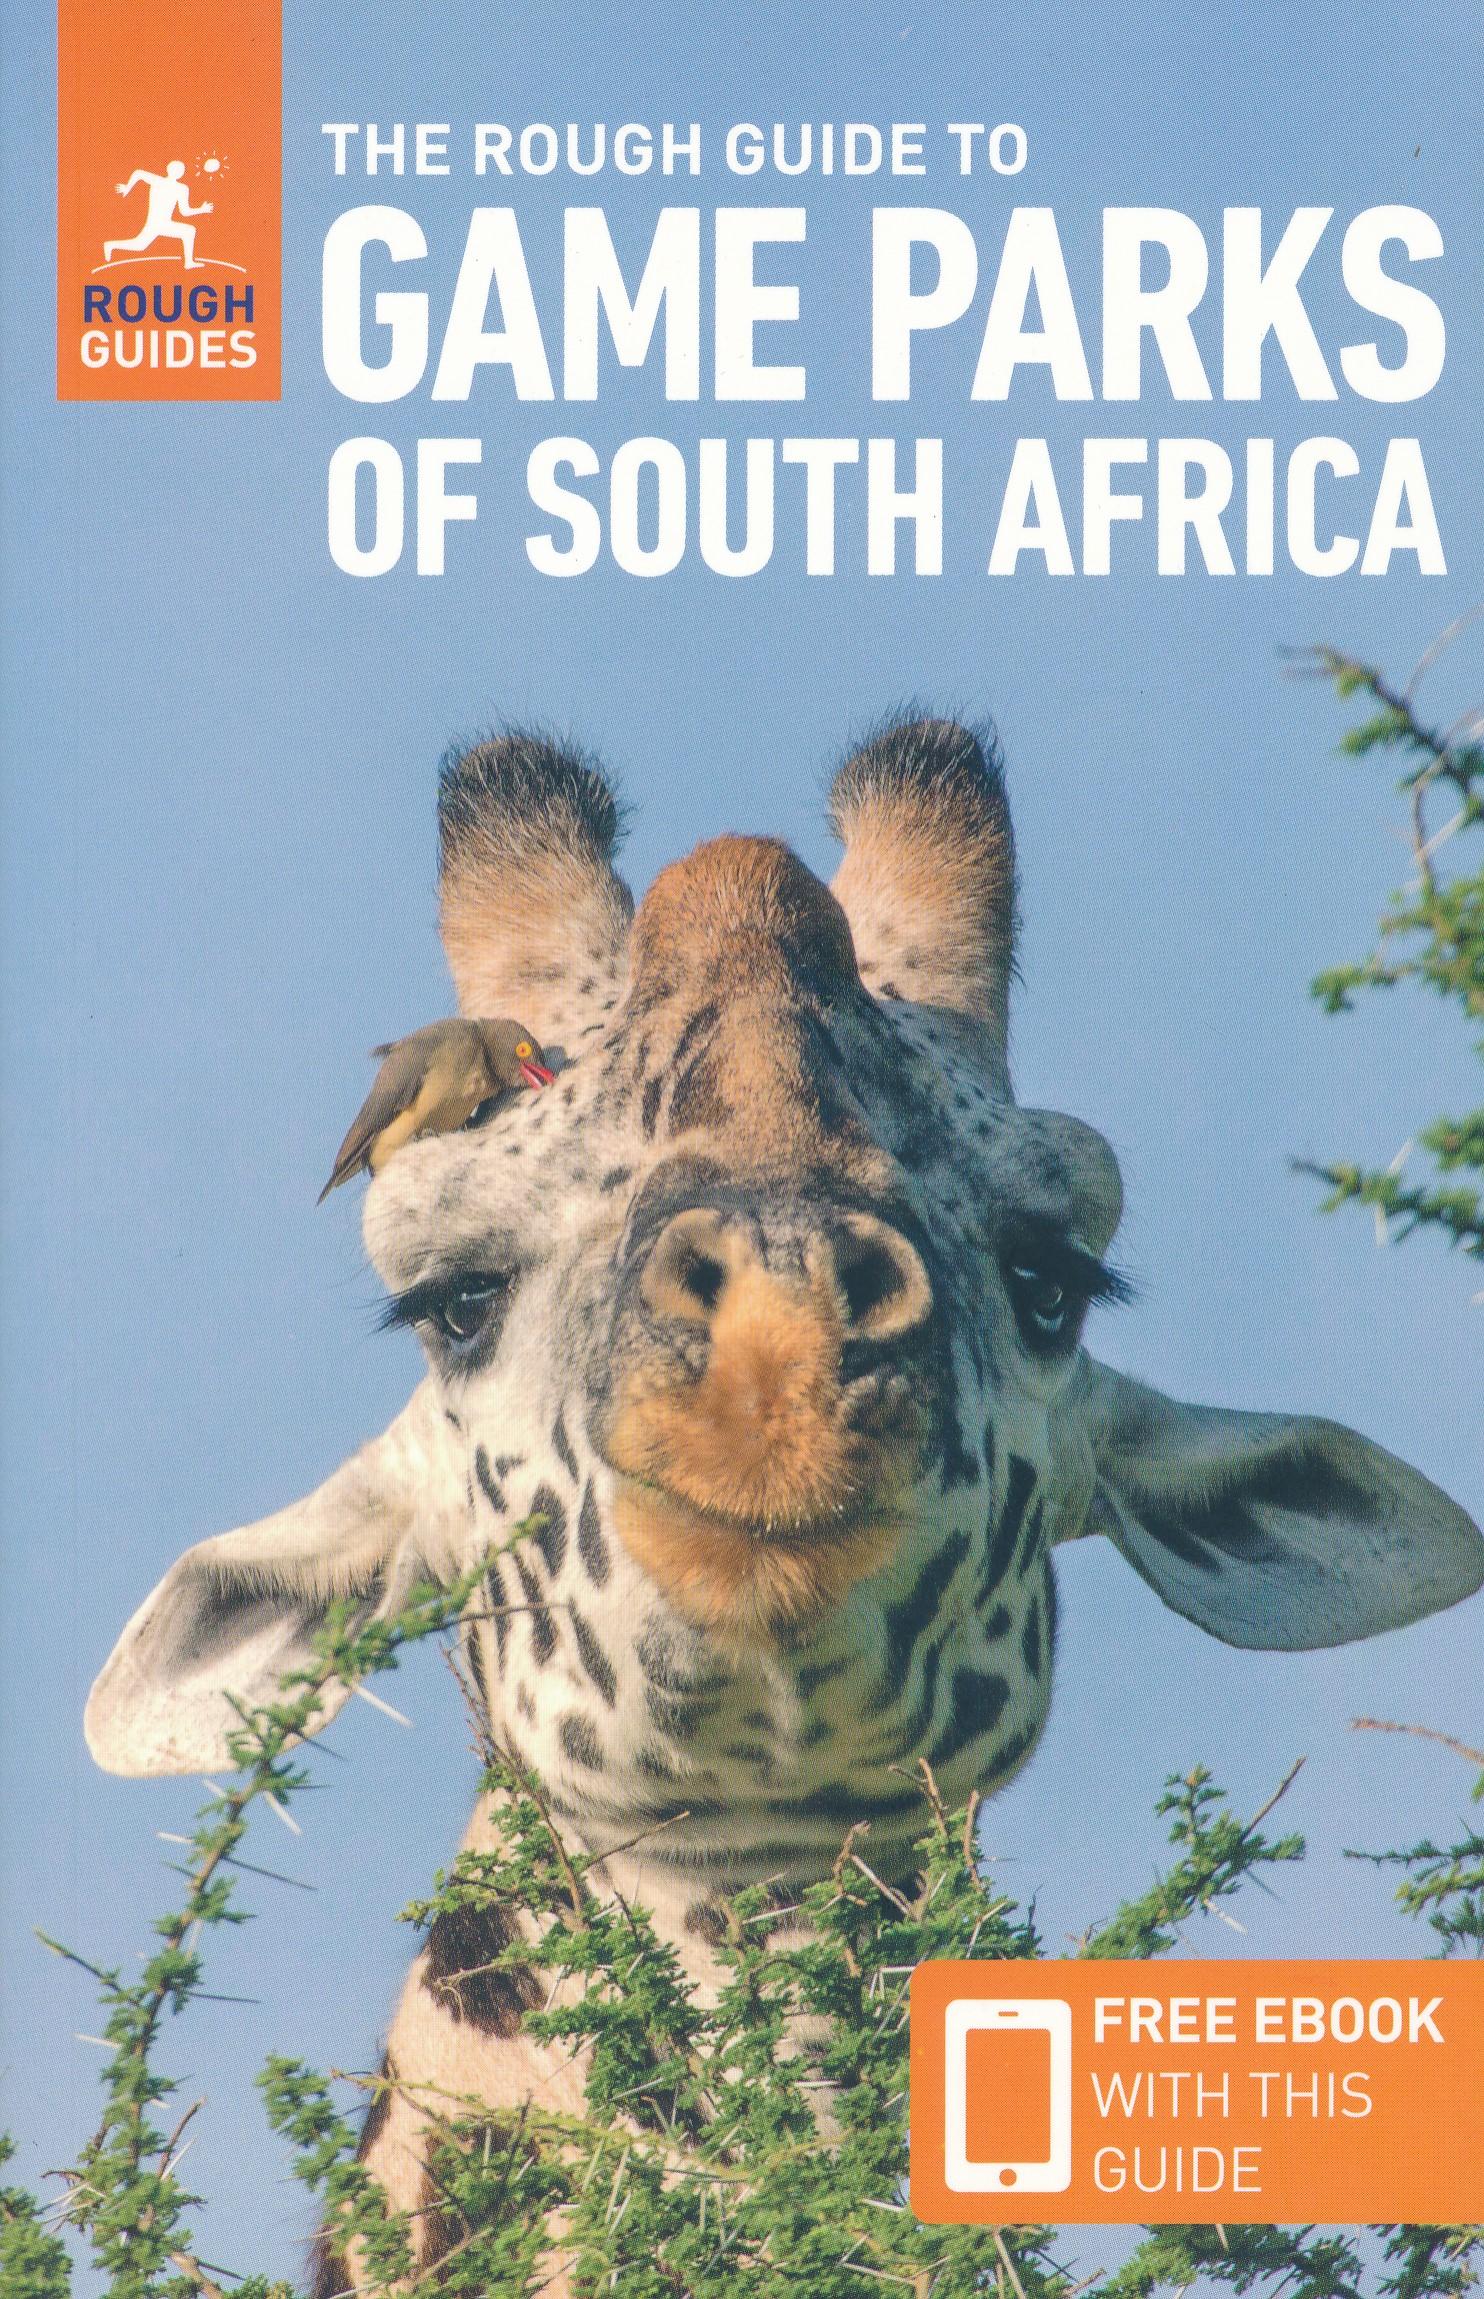 Online bestellen: Reisgids - Natuurgids Game Parks of South Africa - Zuid Afrika wildparken | Rough Guides